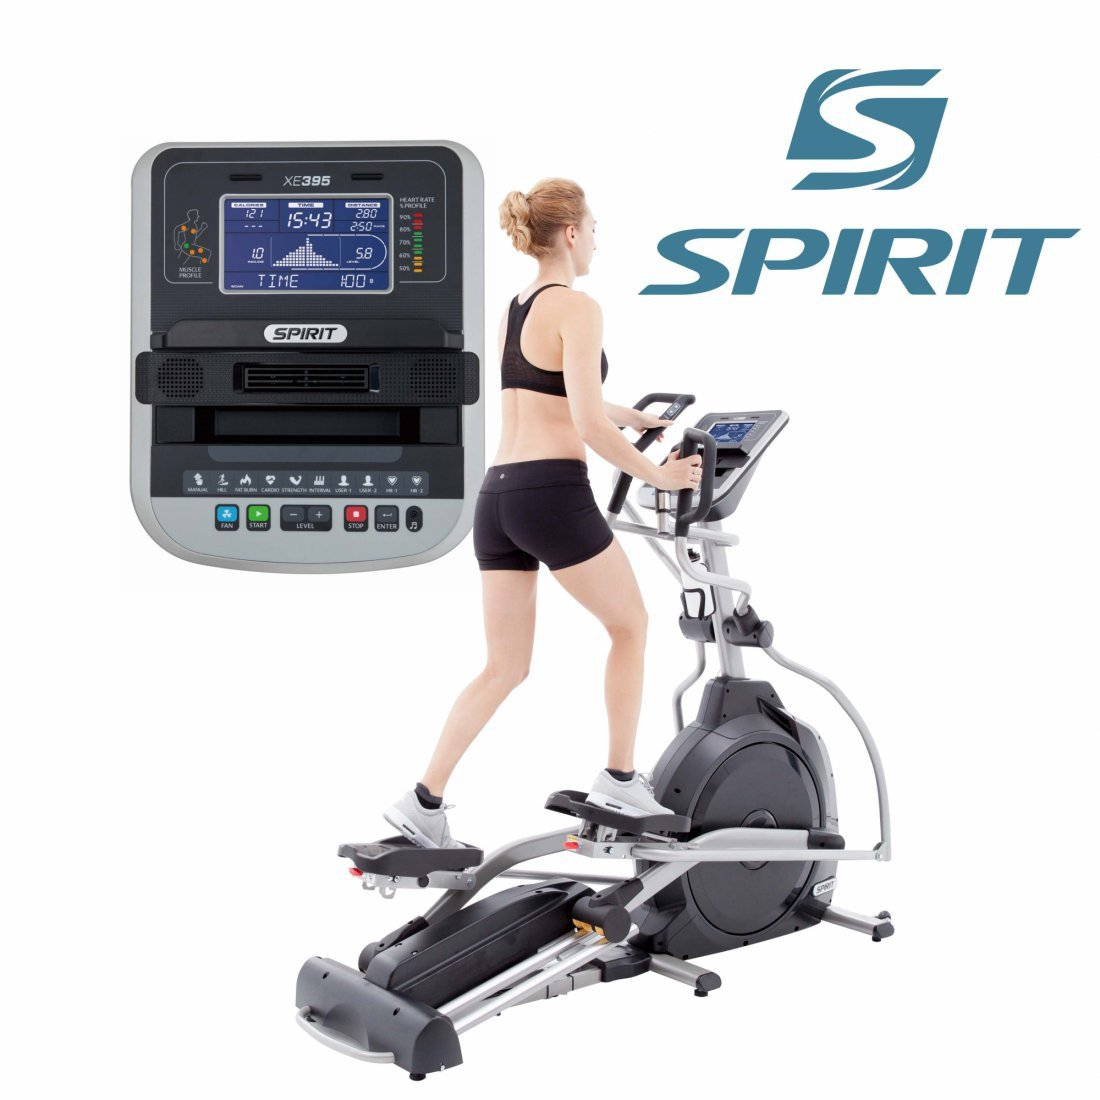 Spirit Profi Ellipsentrainer XE 395 Crosstrainer Heimtrainer ...